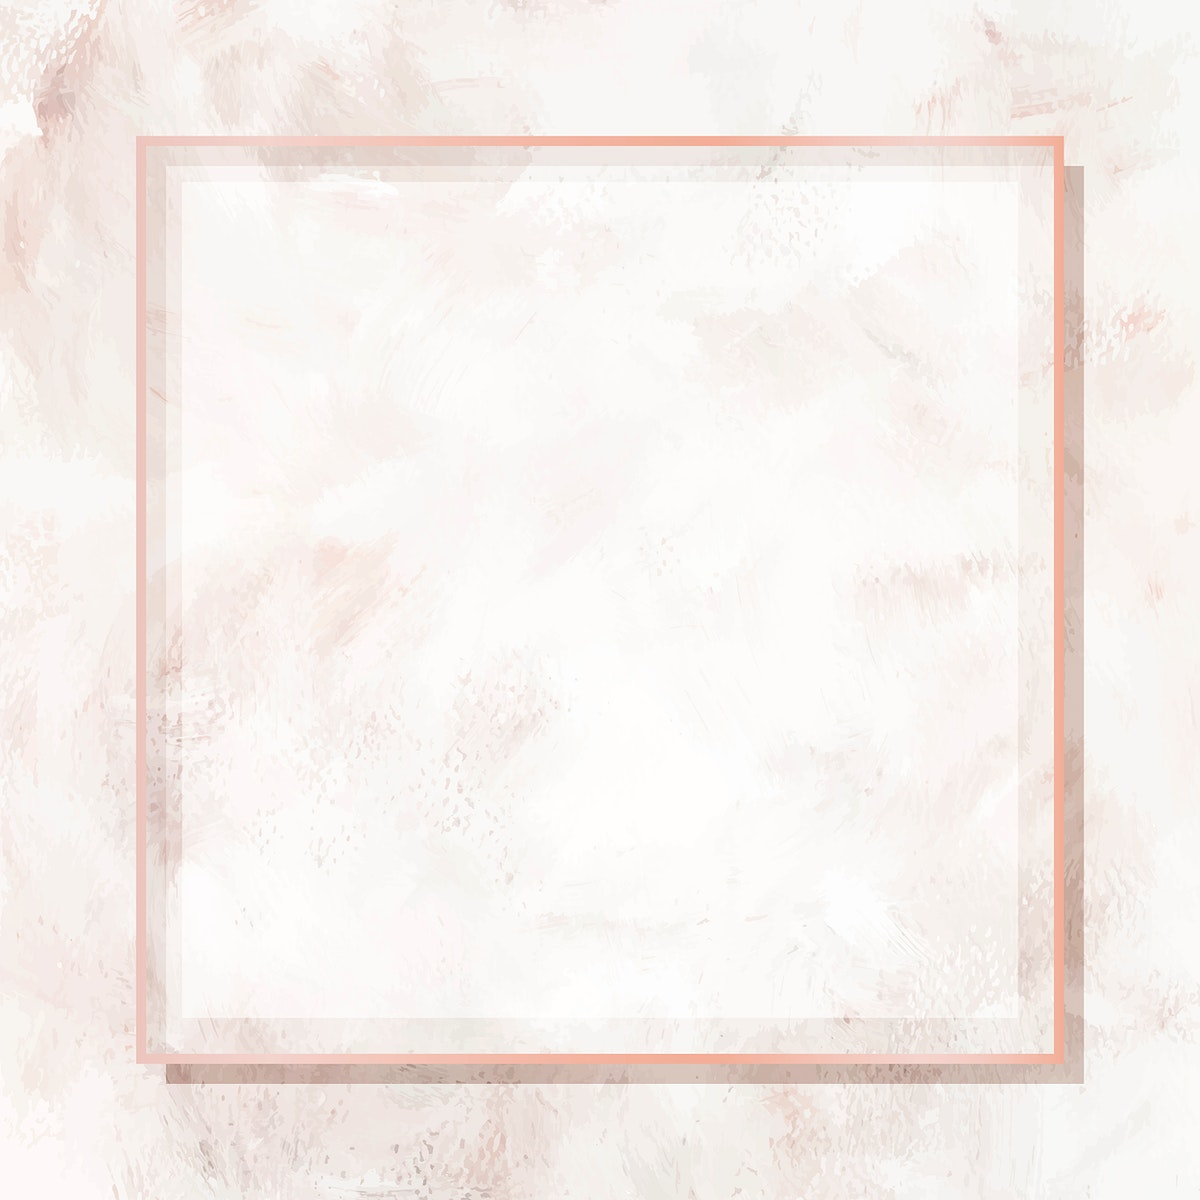 Square rose gold frame on beige marble background vector